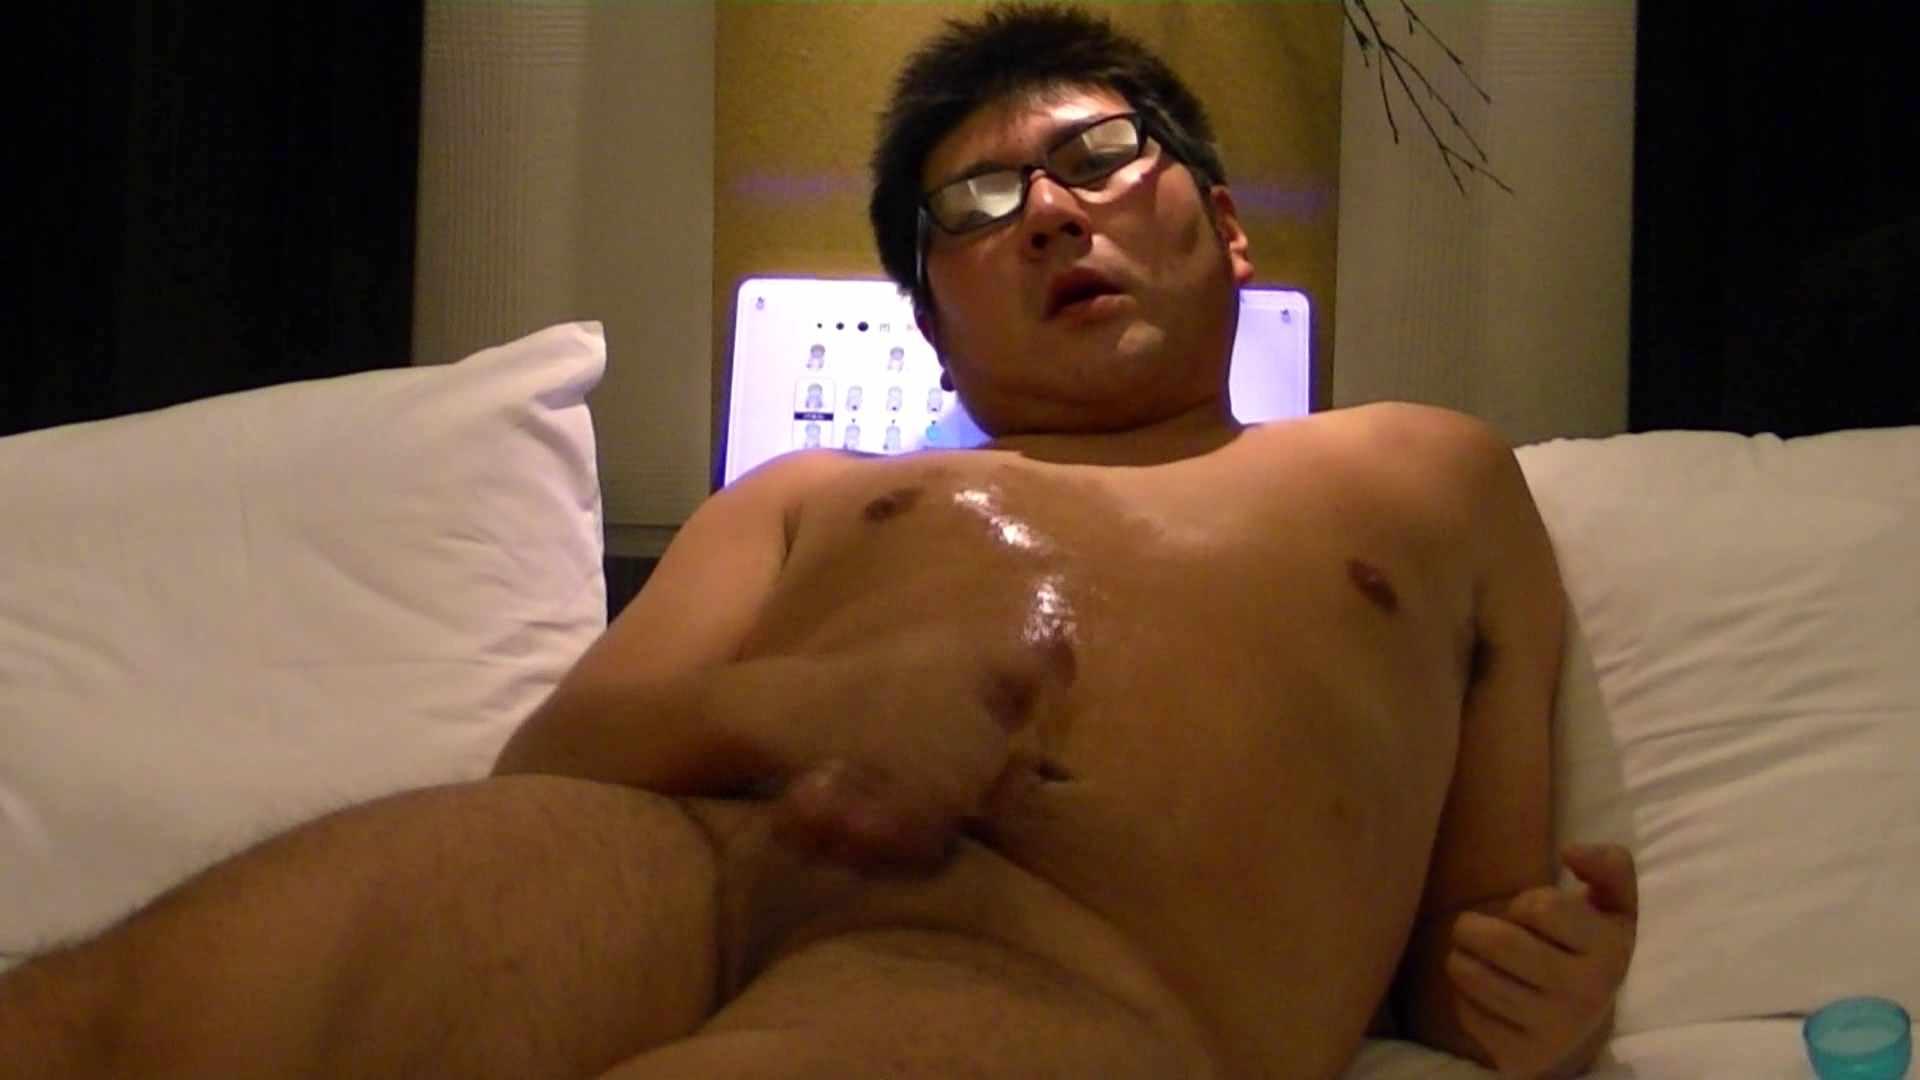 Mr.オナックスさん投稿!HD 貴方のオナニー三万円で撮影させてください。VOL.03 後編 完全無修正版  106枚 48